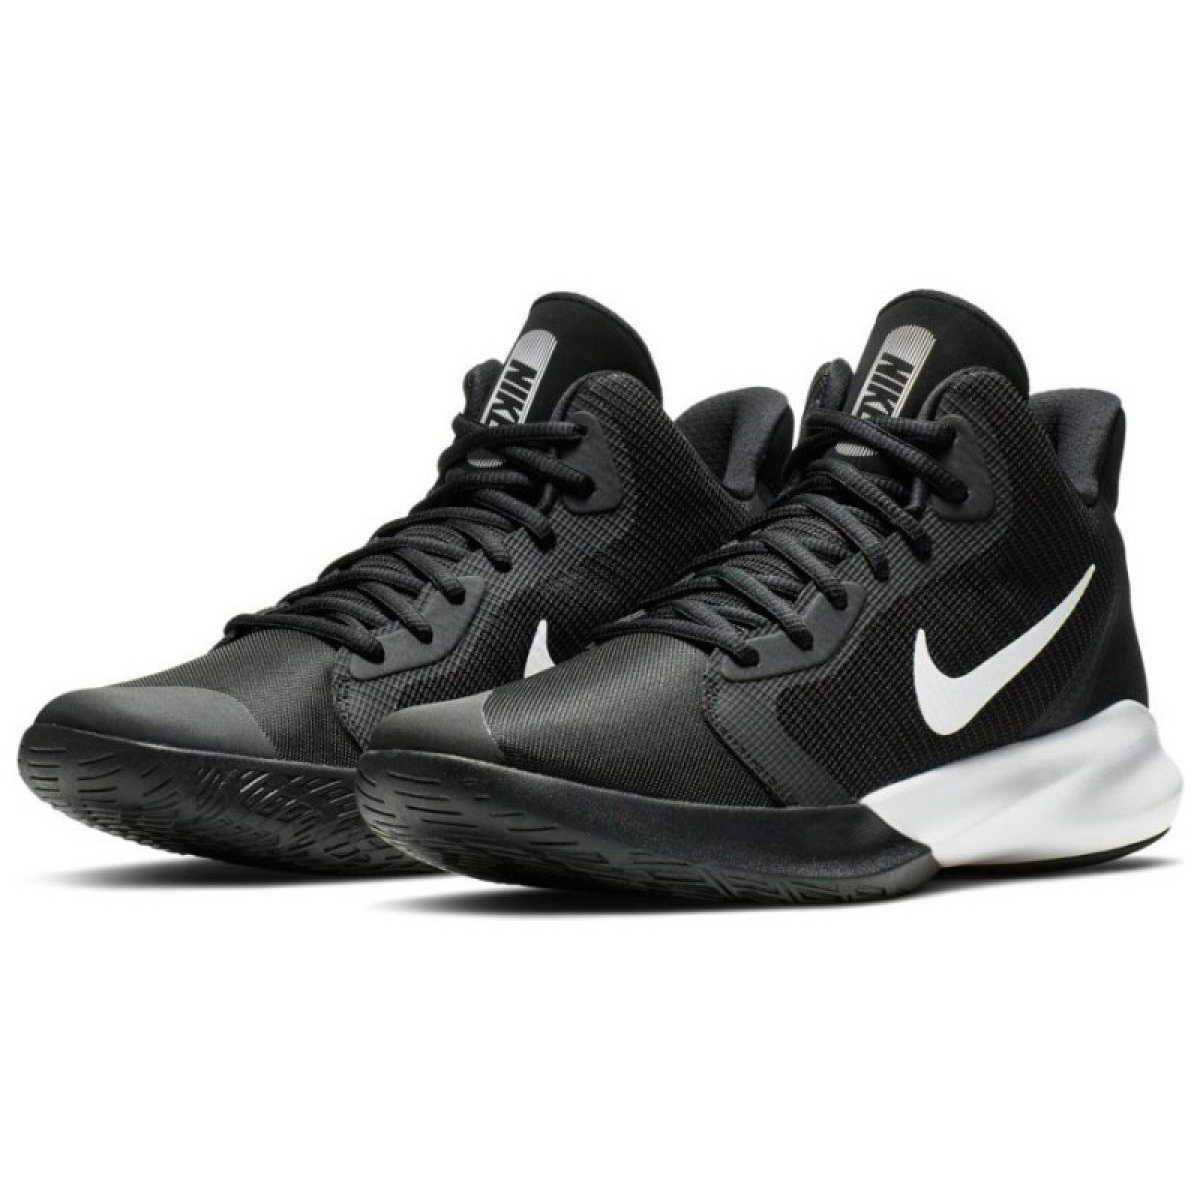 scarpe nike basket nere